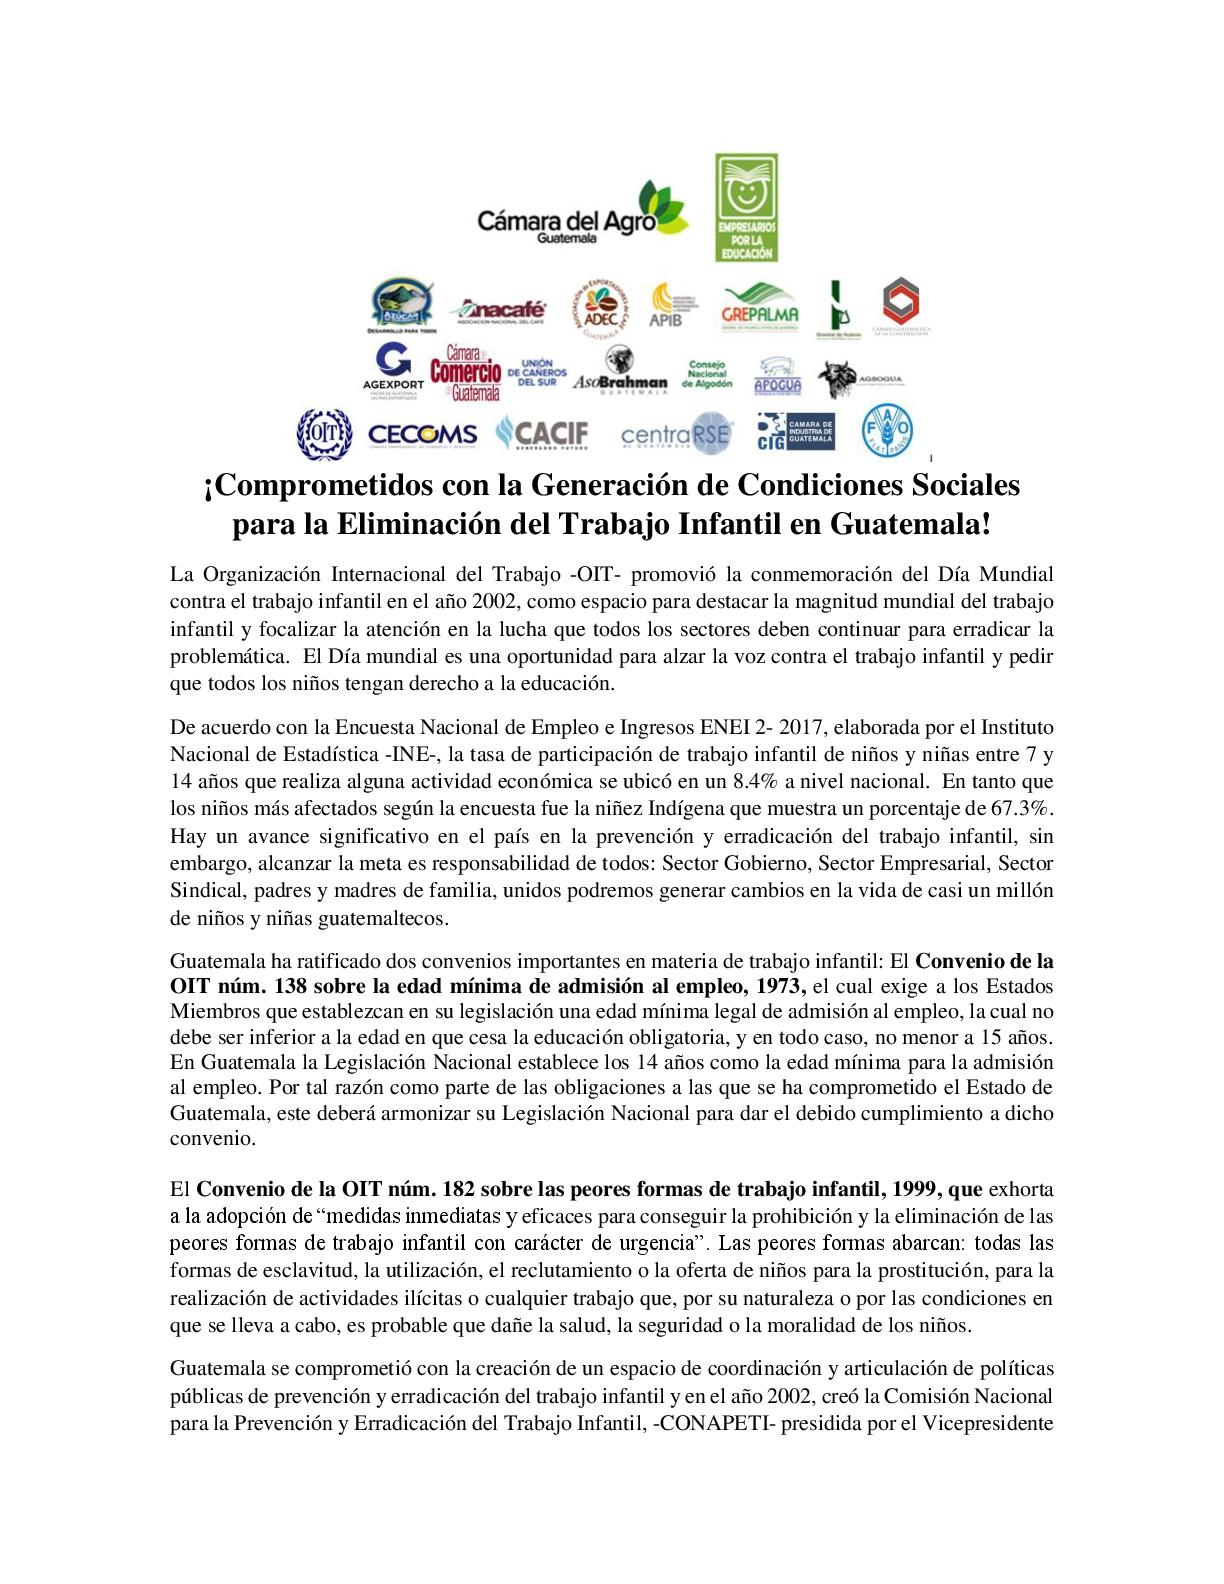 Di_a_Mundial_Contra_el_Trabajo_Infantil_2018_CAMAGRO-001.jpg